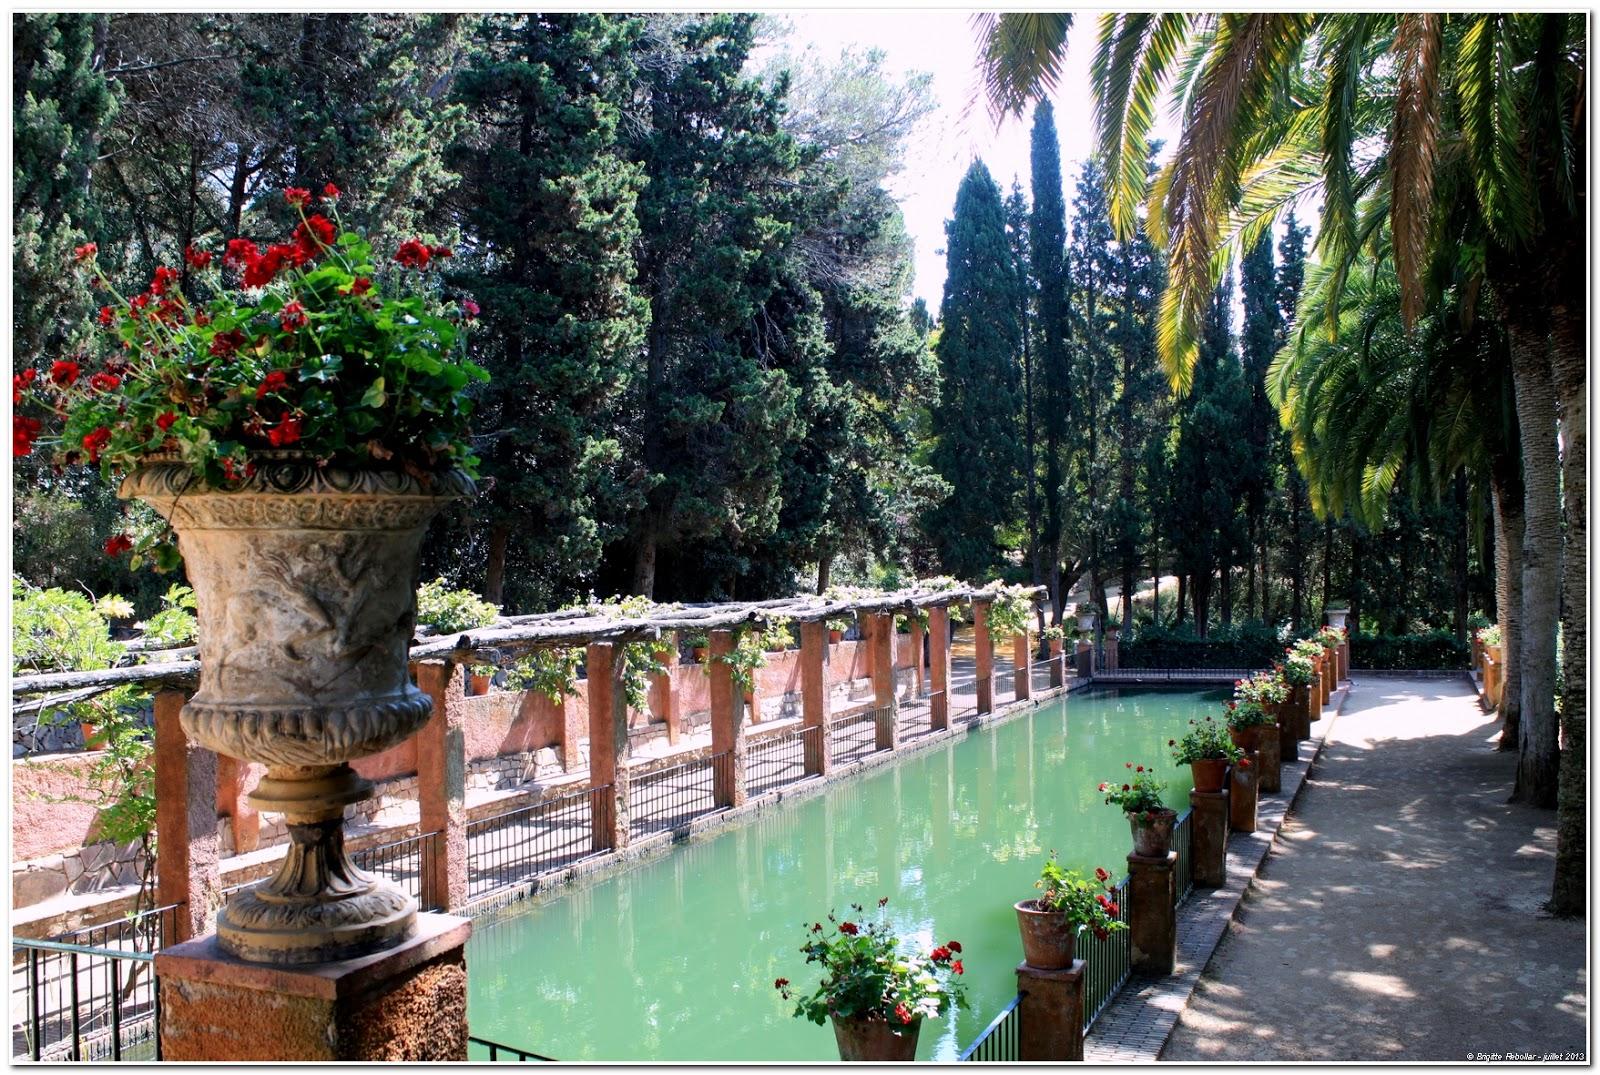 De moi vous jardin botanique pinya de rosa blanes for Jardin 5 juillet biskra